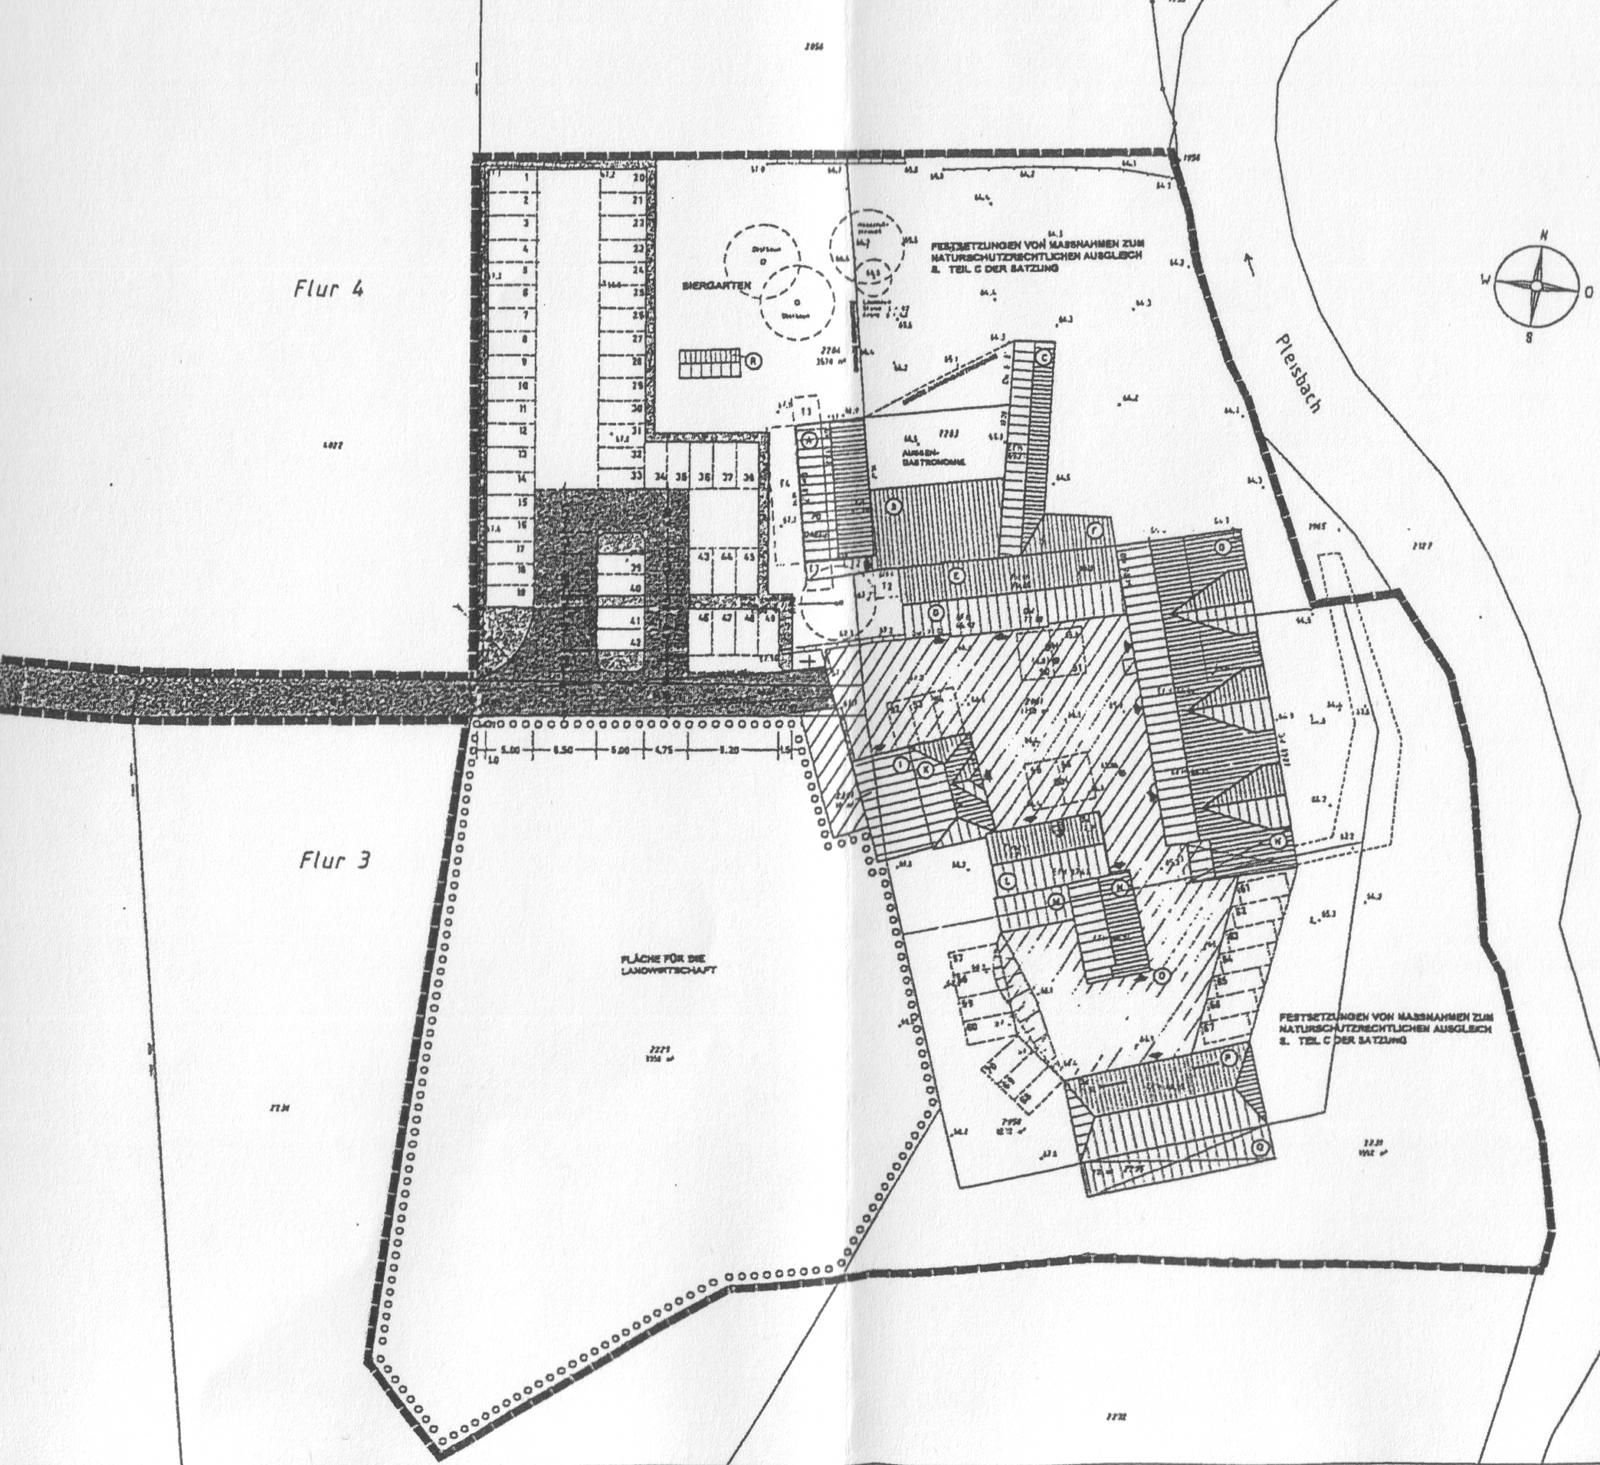 vorhabenbezogener bebauungsplan nr 614 der stadt sankt augustin niederpleiser m hle. Black Bedroom Furniture Sets. Home Design Ideas